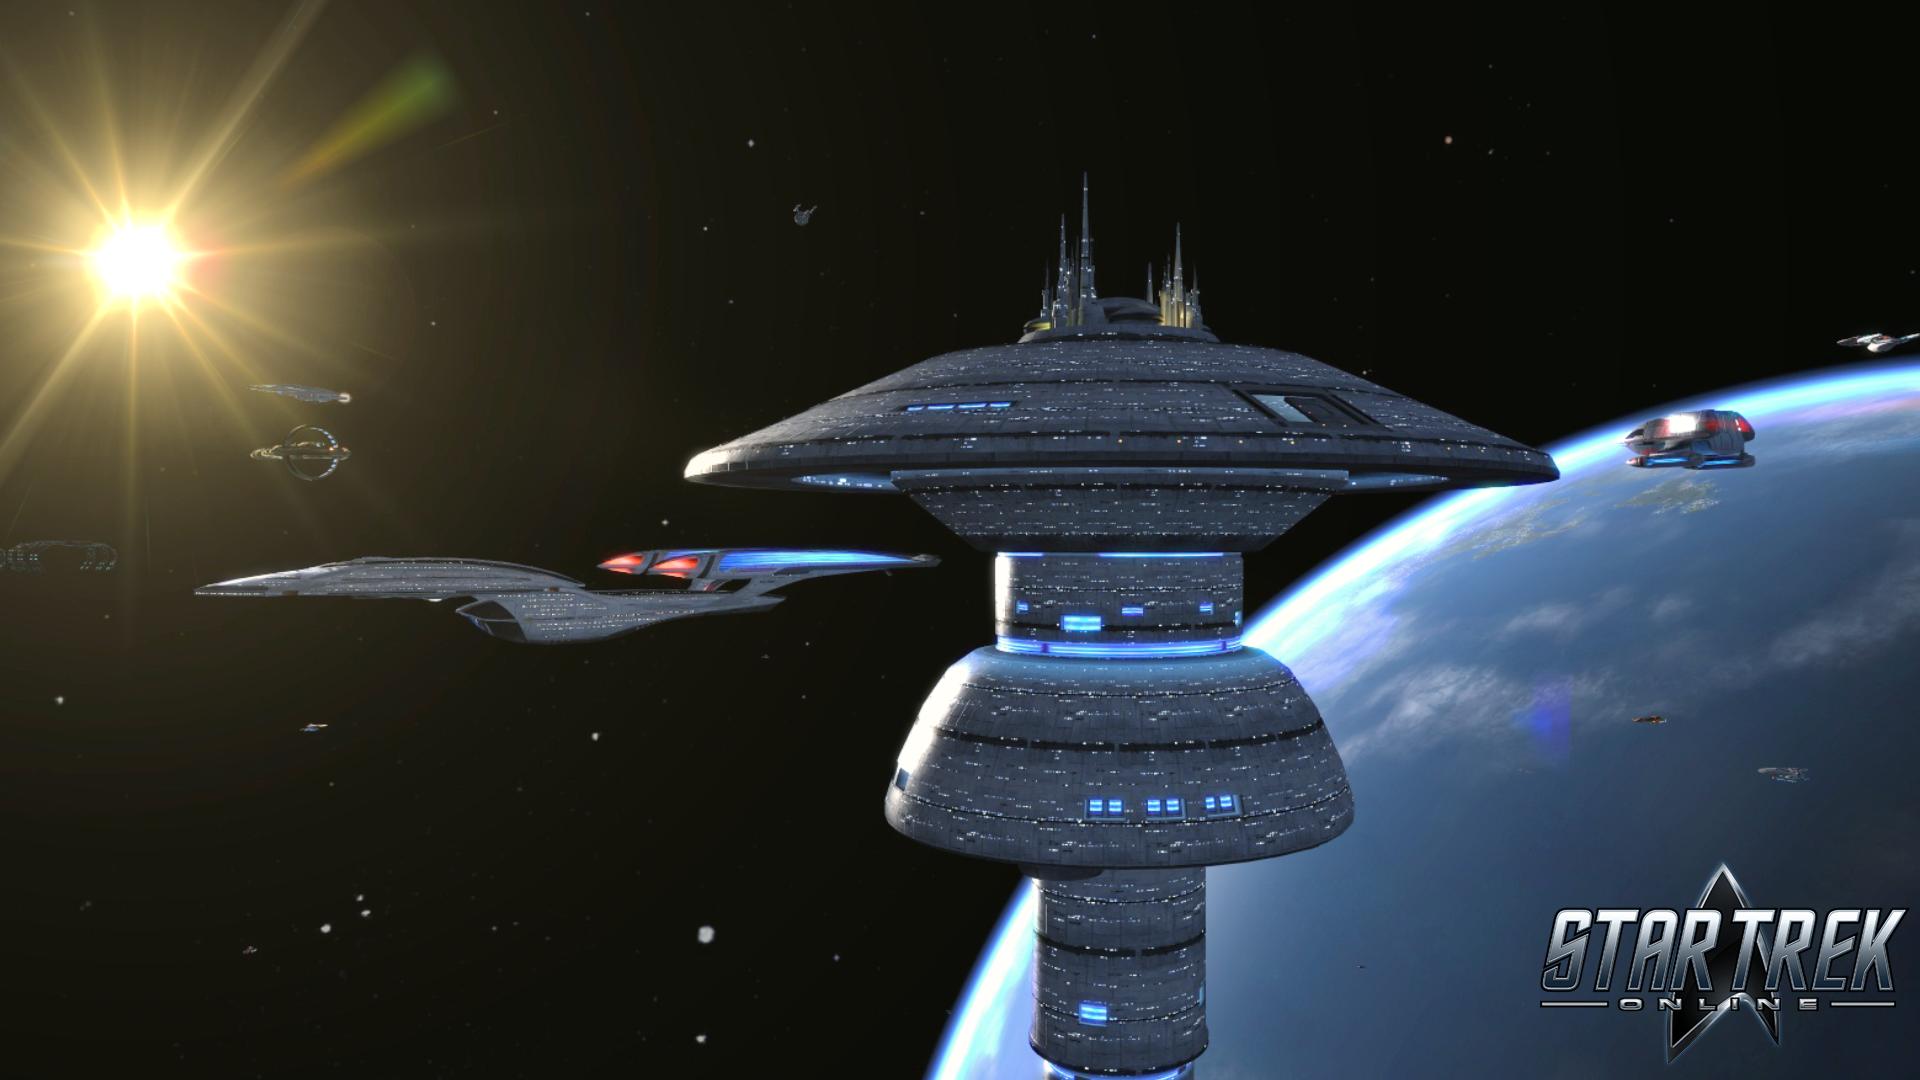 star trek online how to leave 23rd century